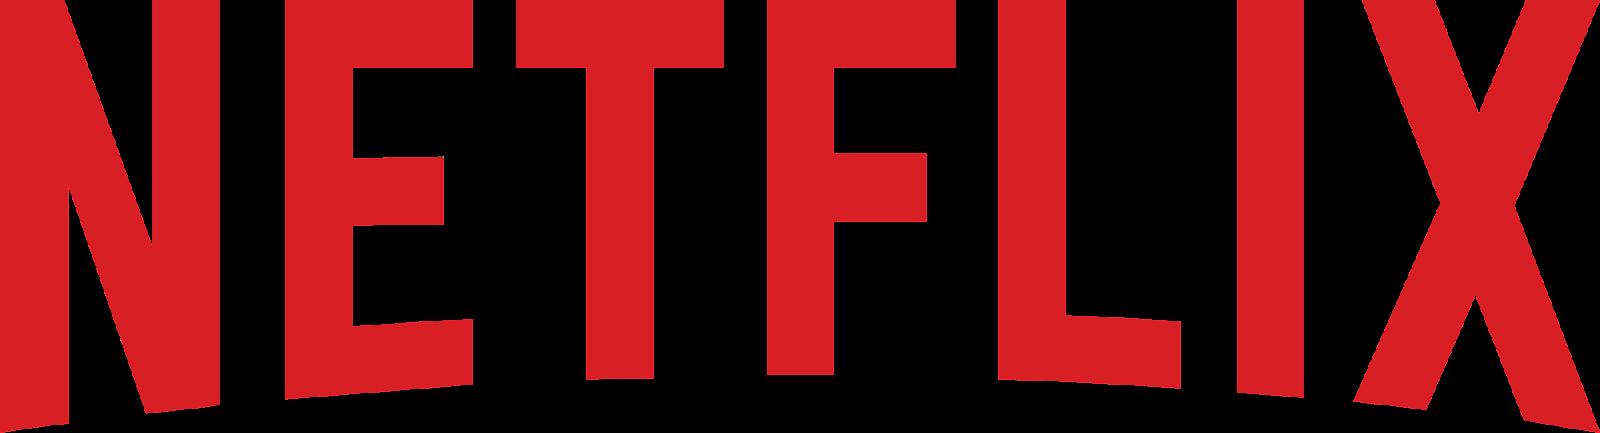 Netflix_2015_logo.svg.png